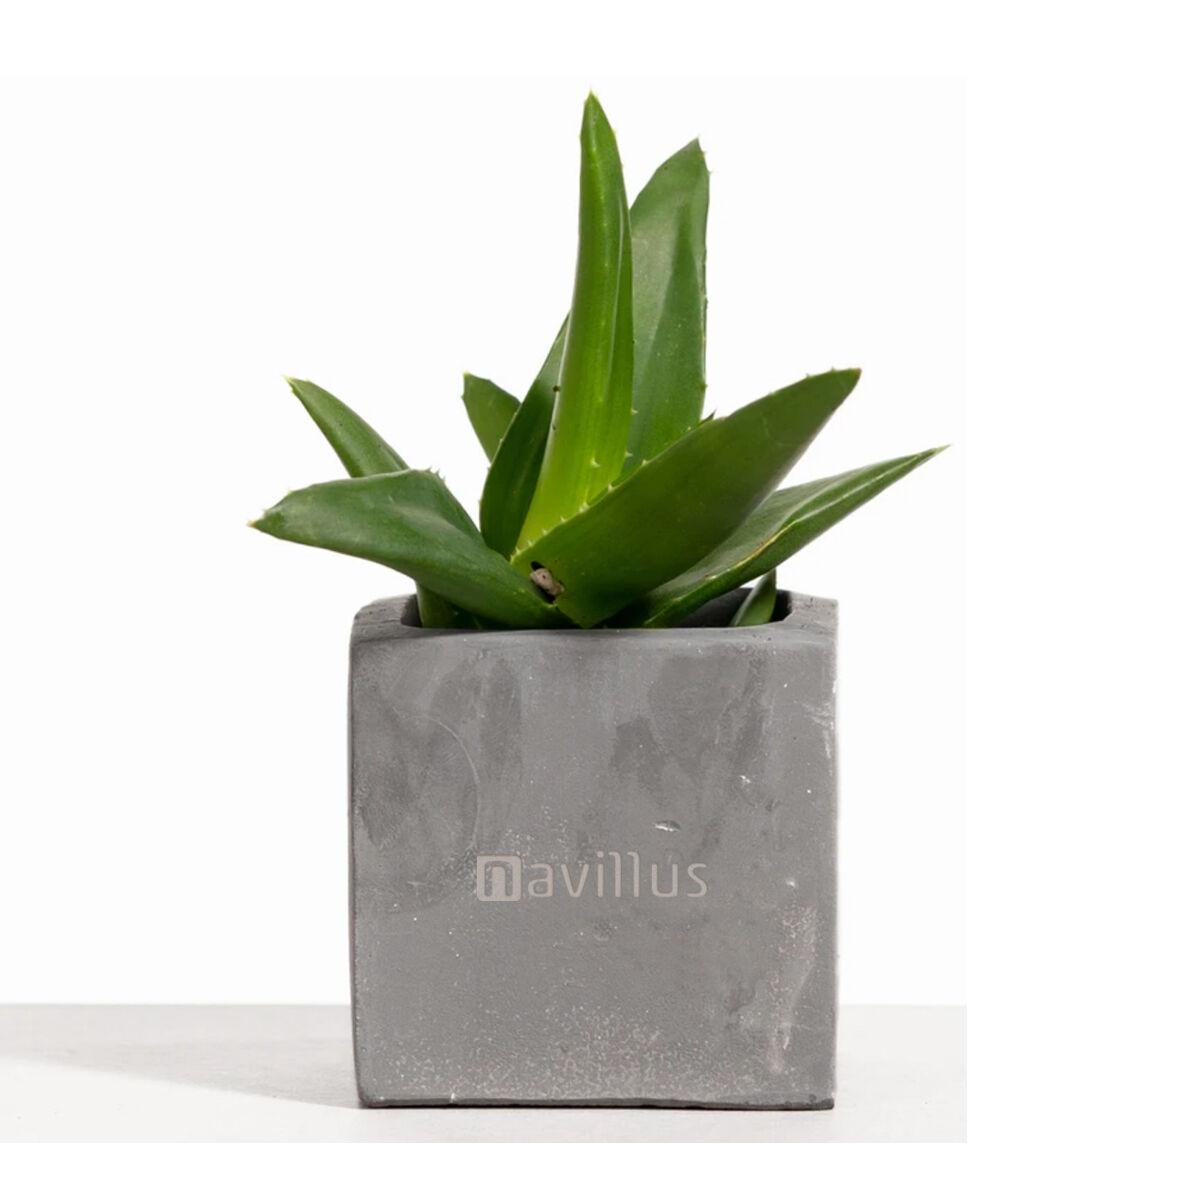 Desk Plant with Graphite Clay Pot